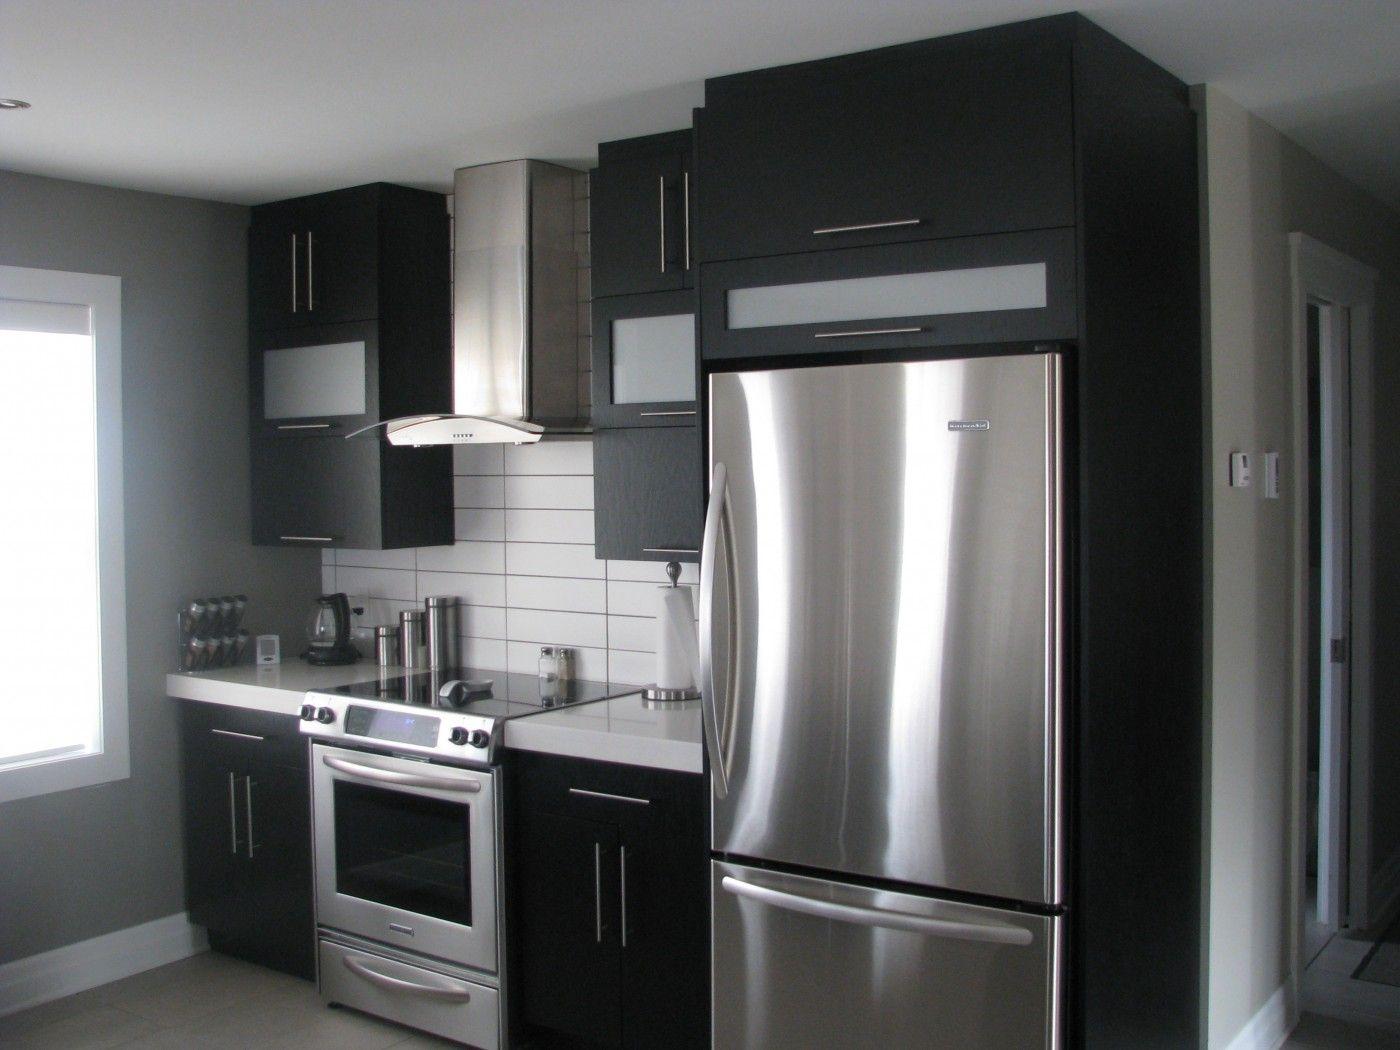 armoires noires dosseret blanc id es d co et am nagement pinterest. Black Bedroom Furniture Sets. Home Design Ideas